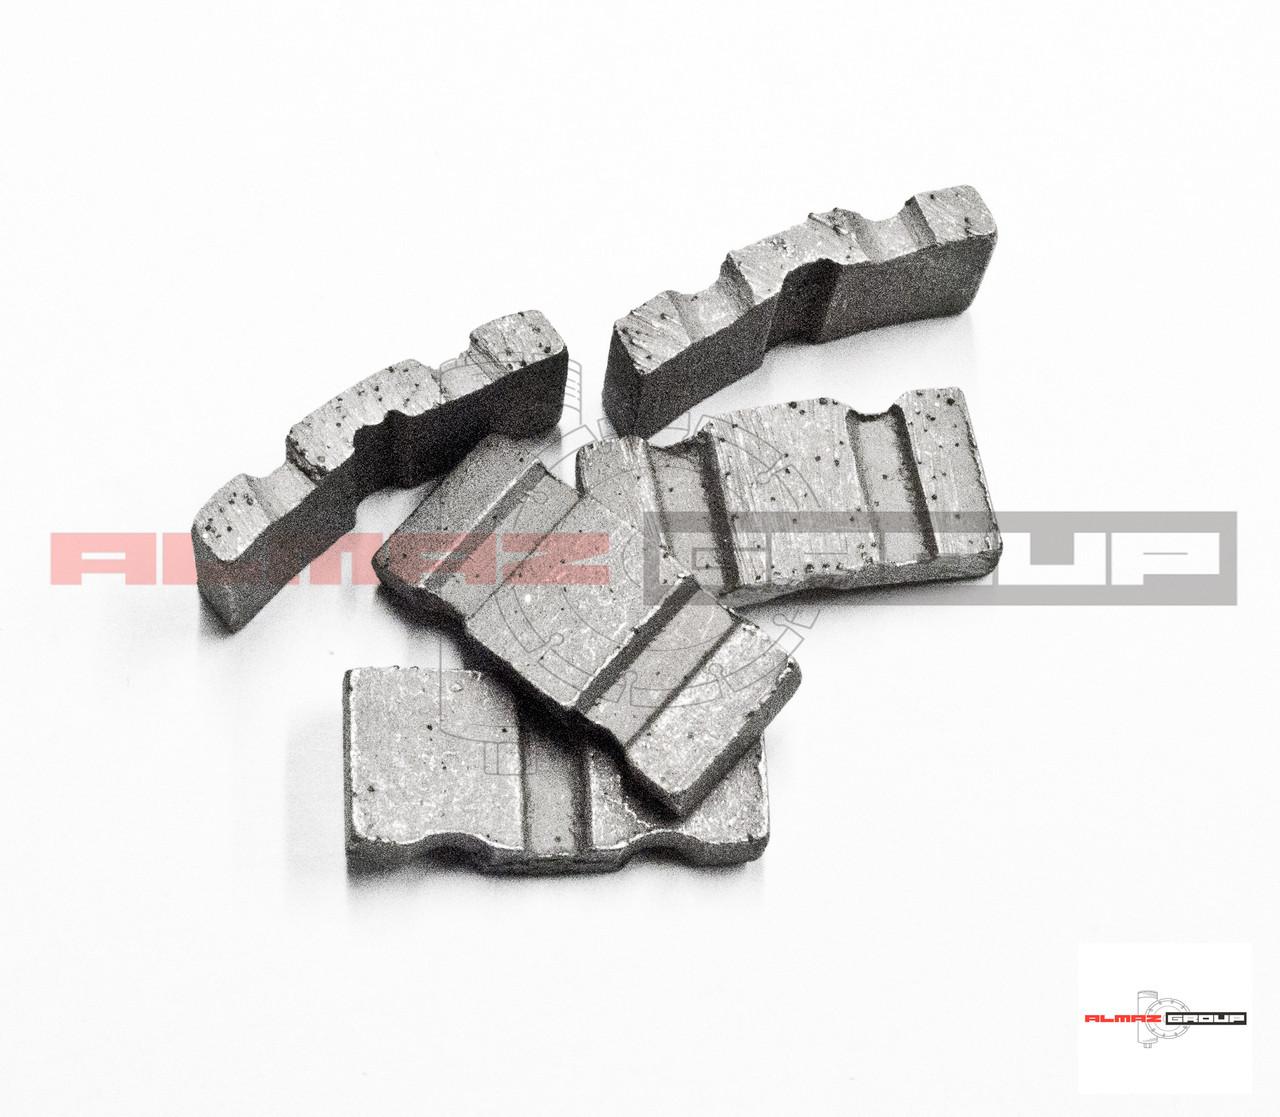 Реставрация алмазных коронок Ø 250 методом напайки сегмента  TURBO-X